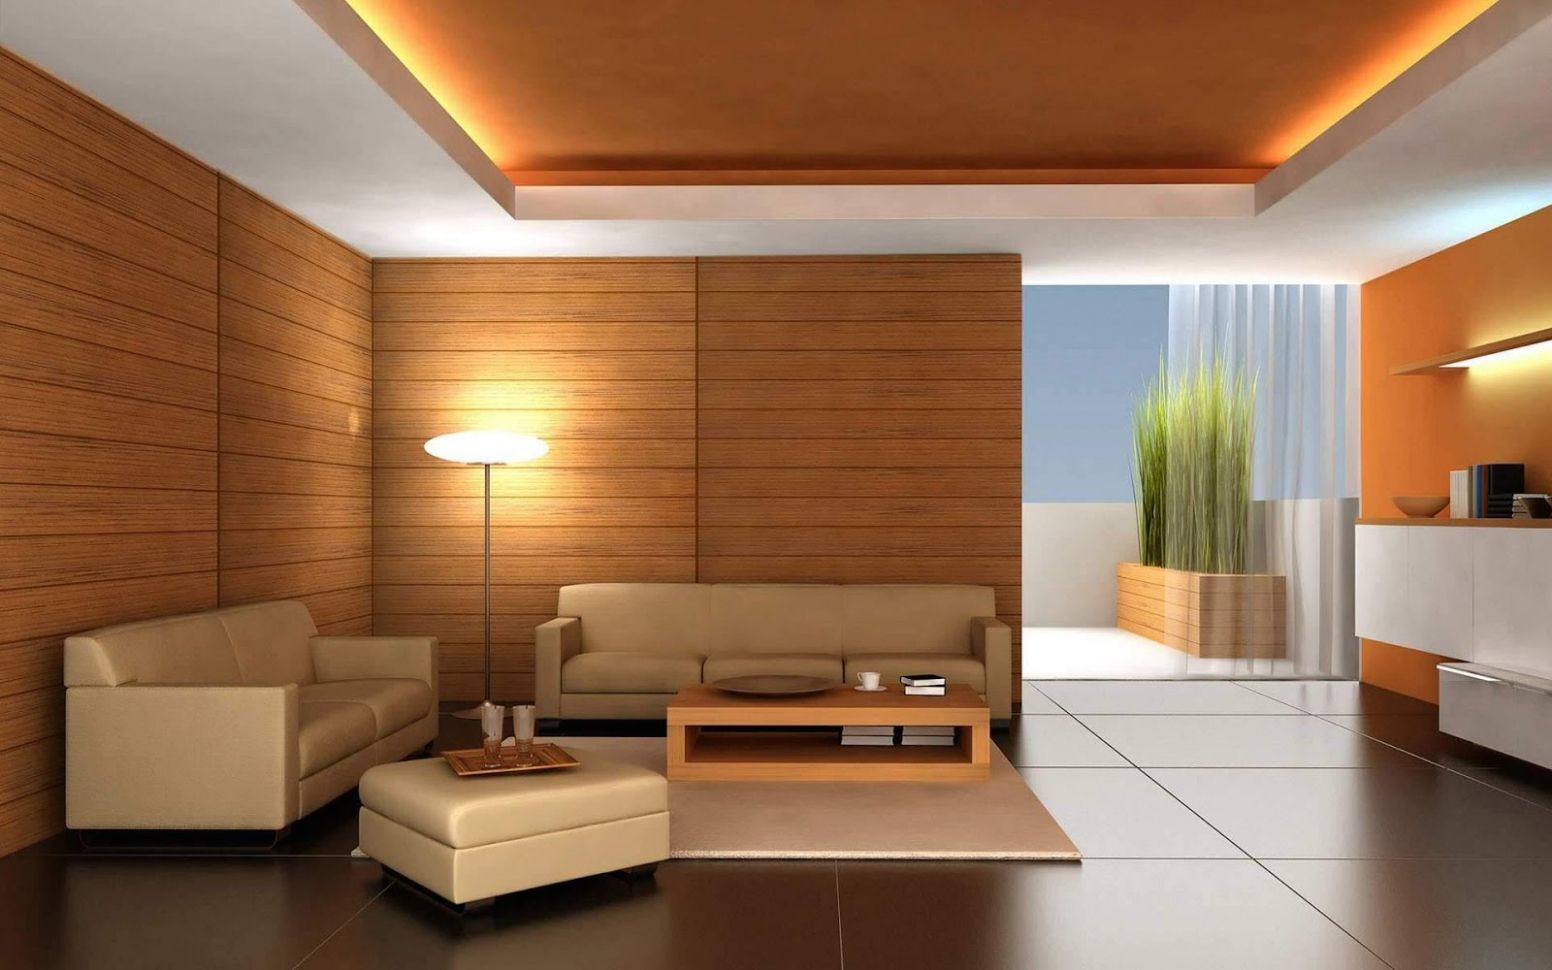 Delightful Interior Design Ideas: 69+ Samples http://freshoom.com/2322-69-2017-gorgeous-interior-design-ideas/